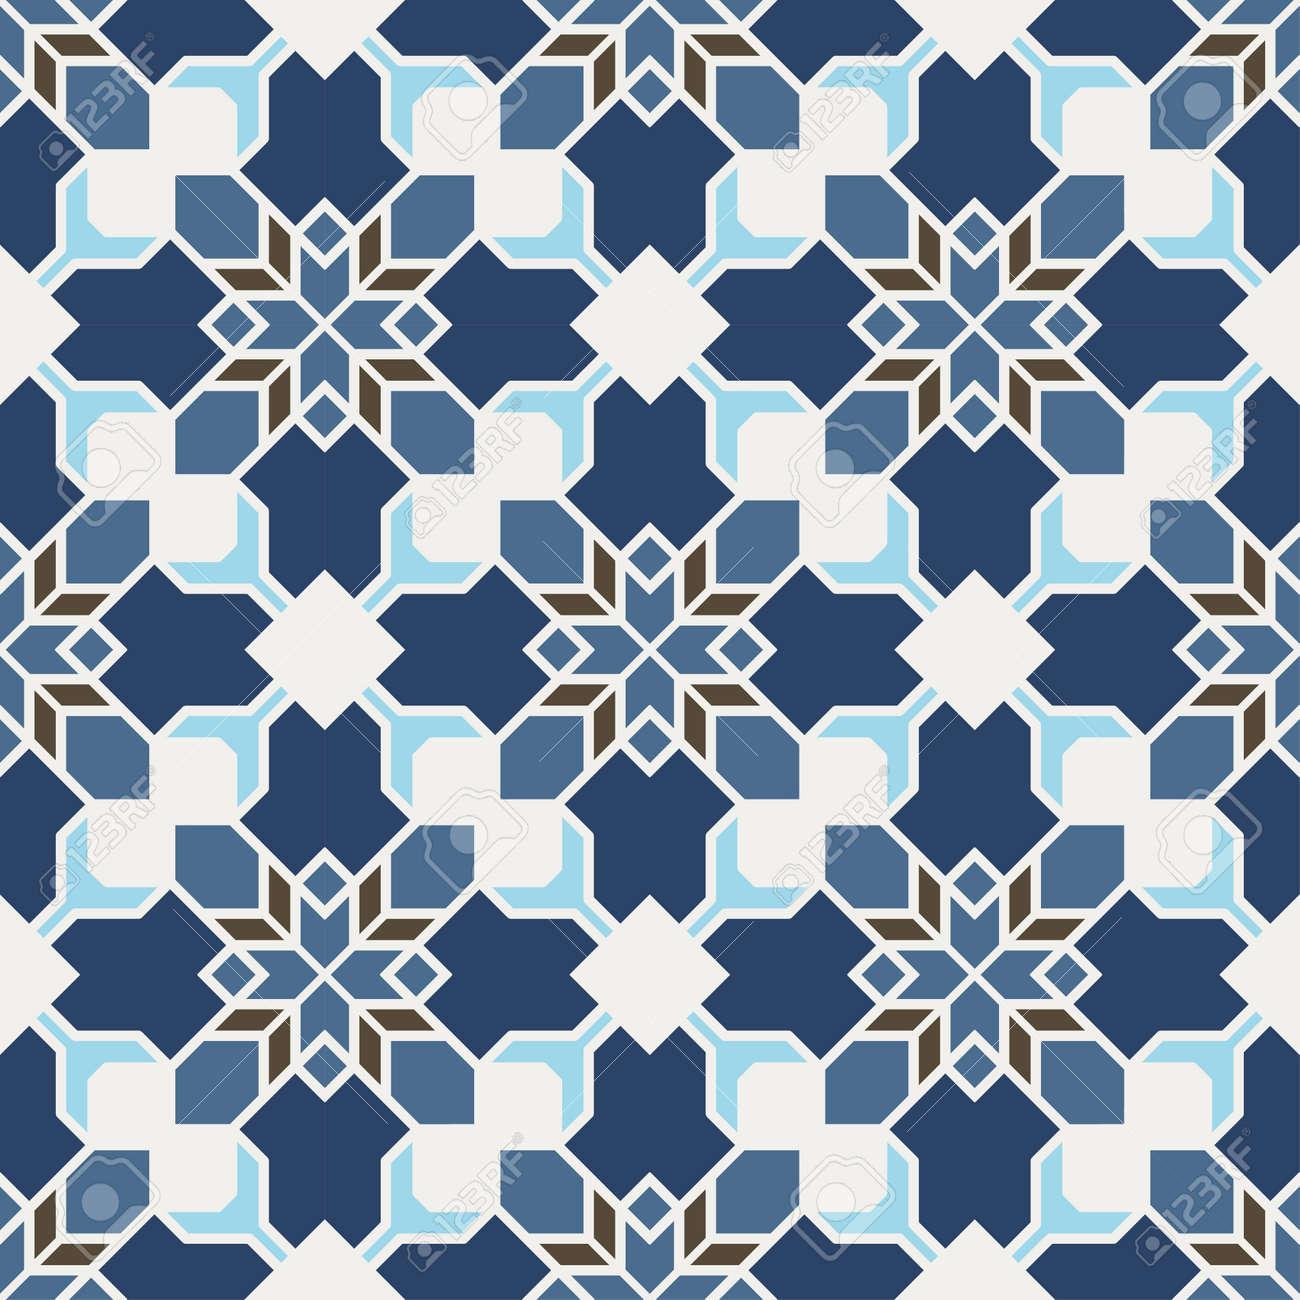 Abstract Seamless Geometric Islamic Wallpaper  Vector Arabic